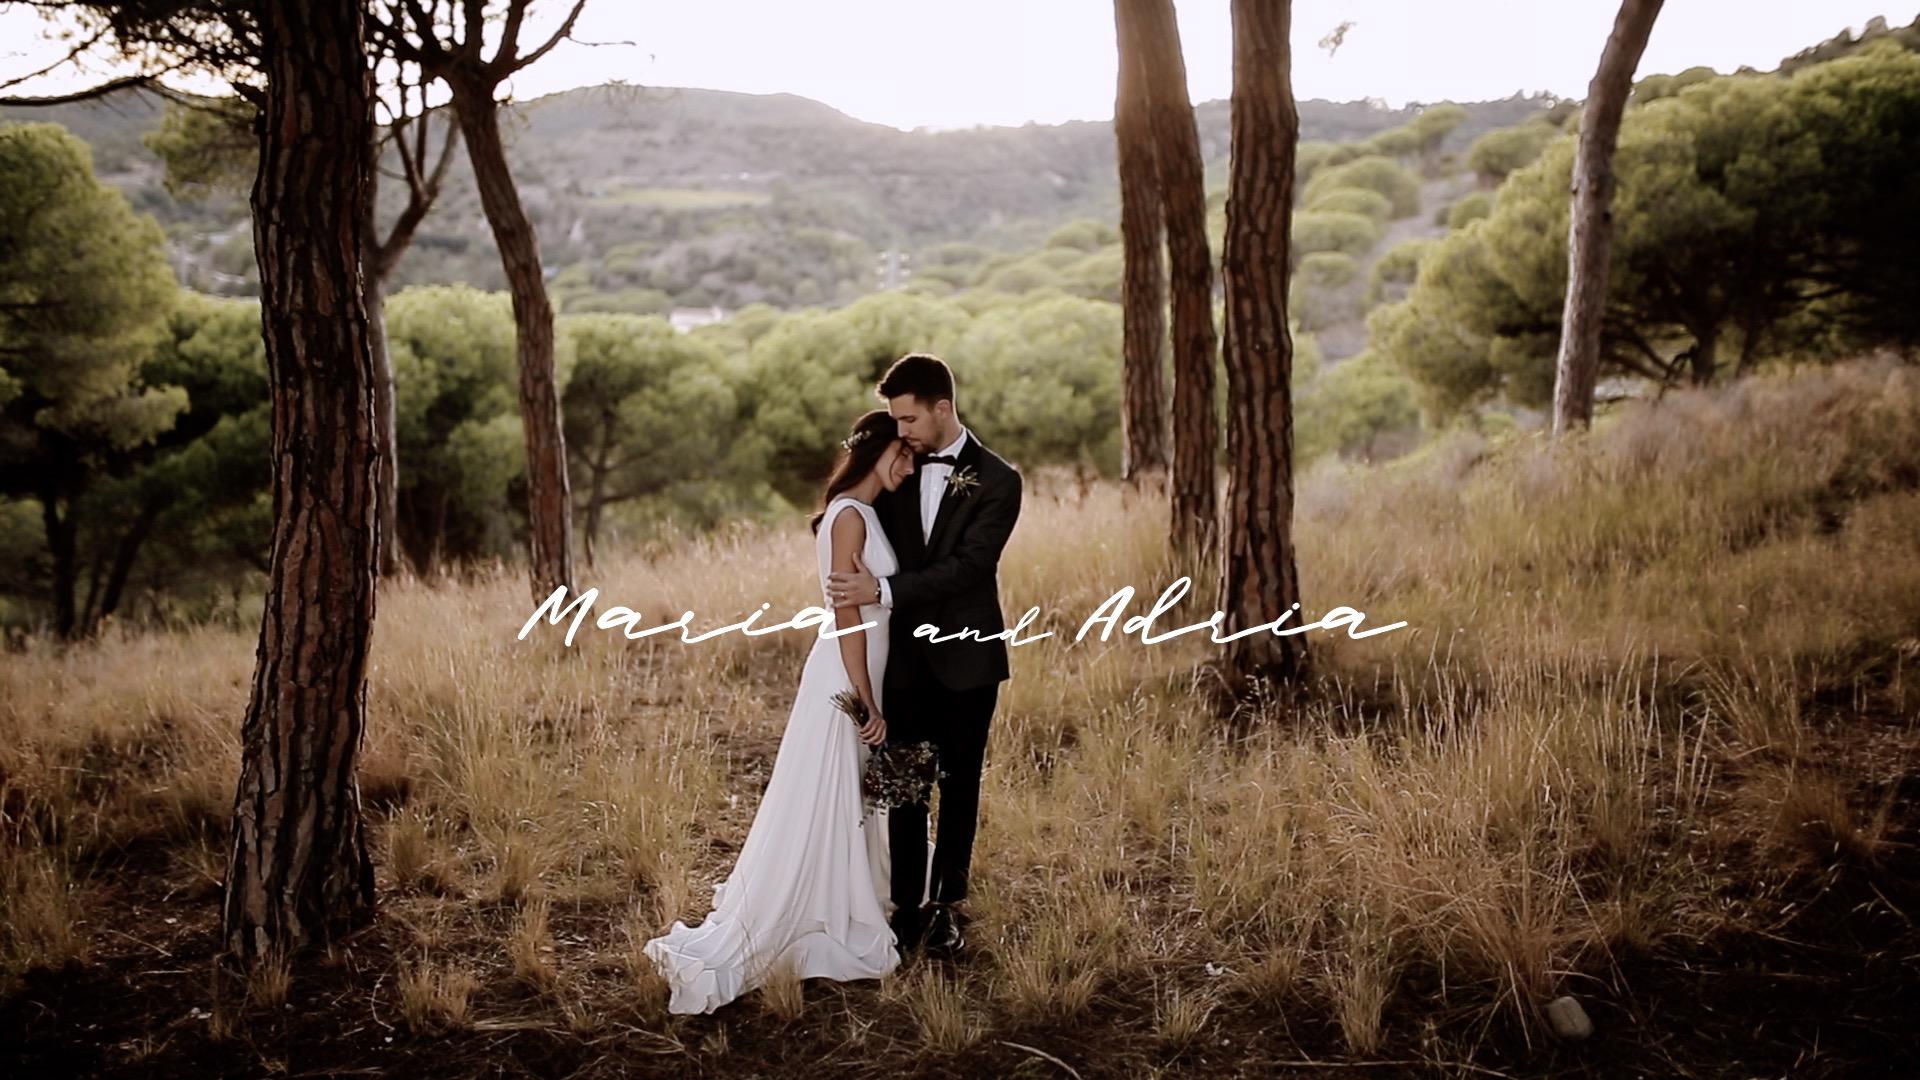 el amor existe, adrià maria, fénix visual, videógrafo de bodas,